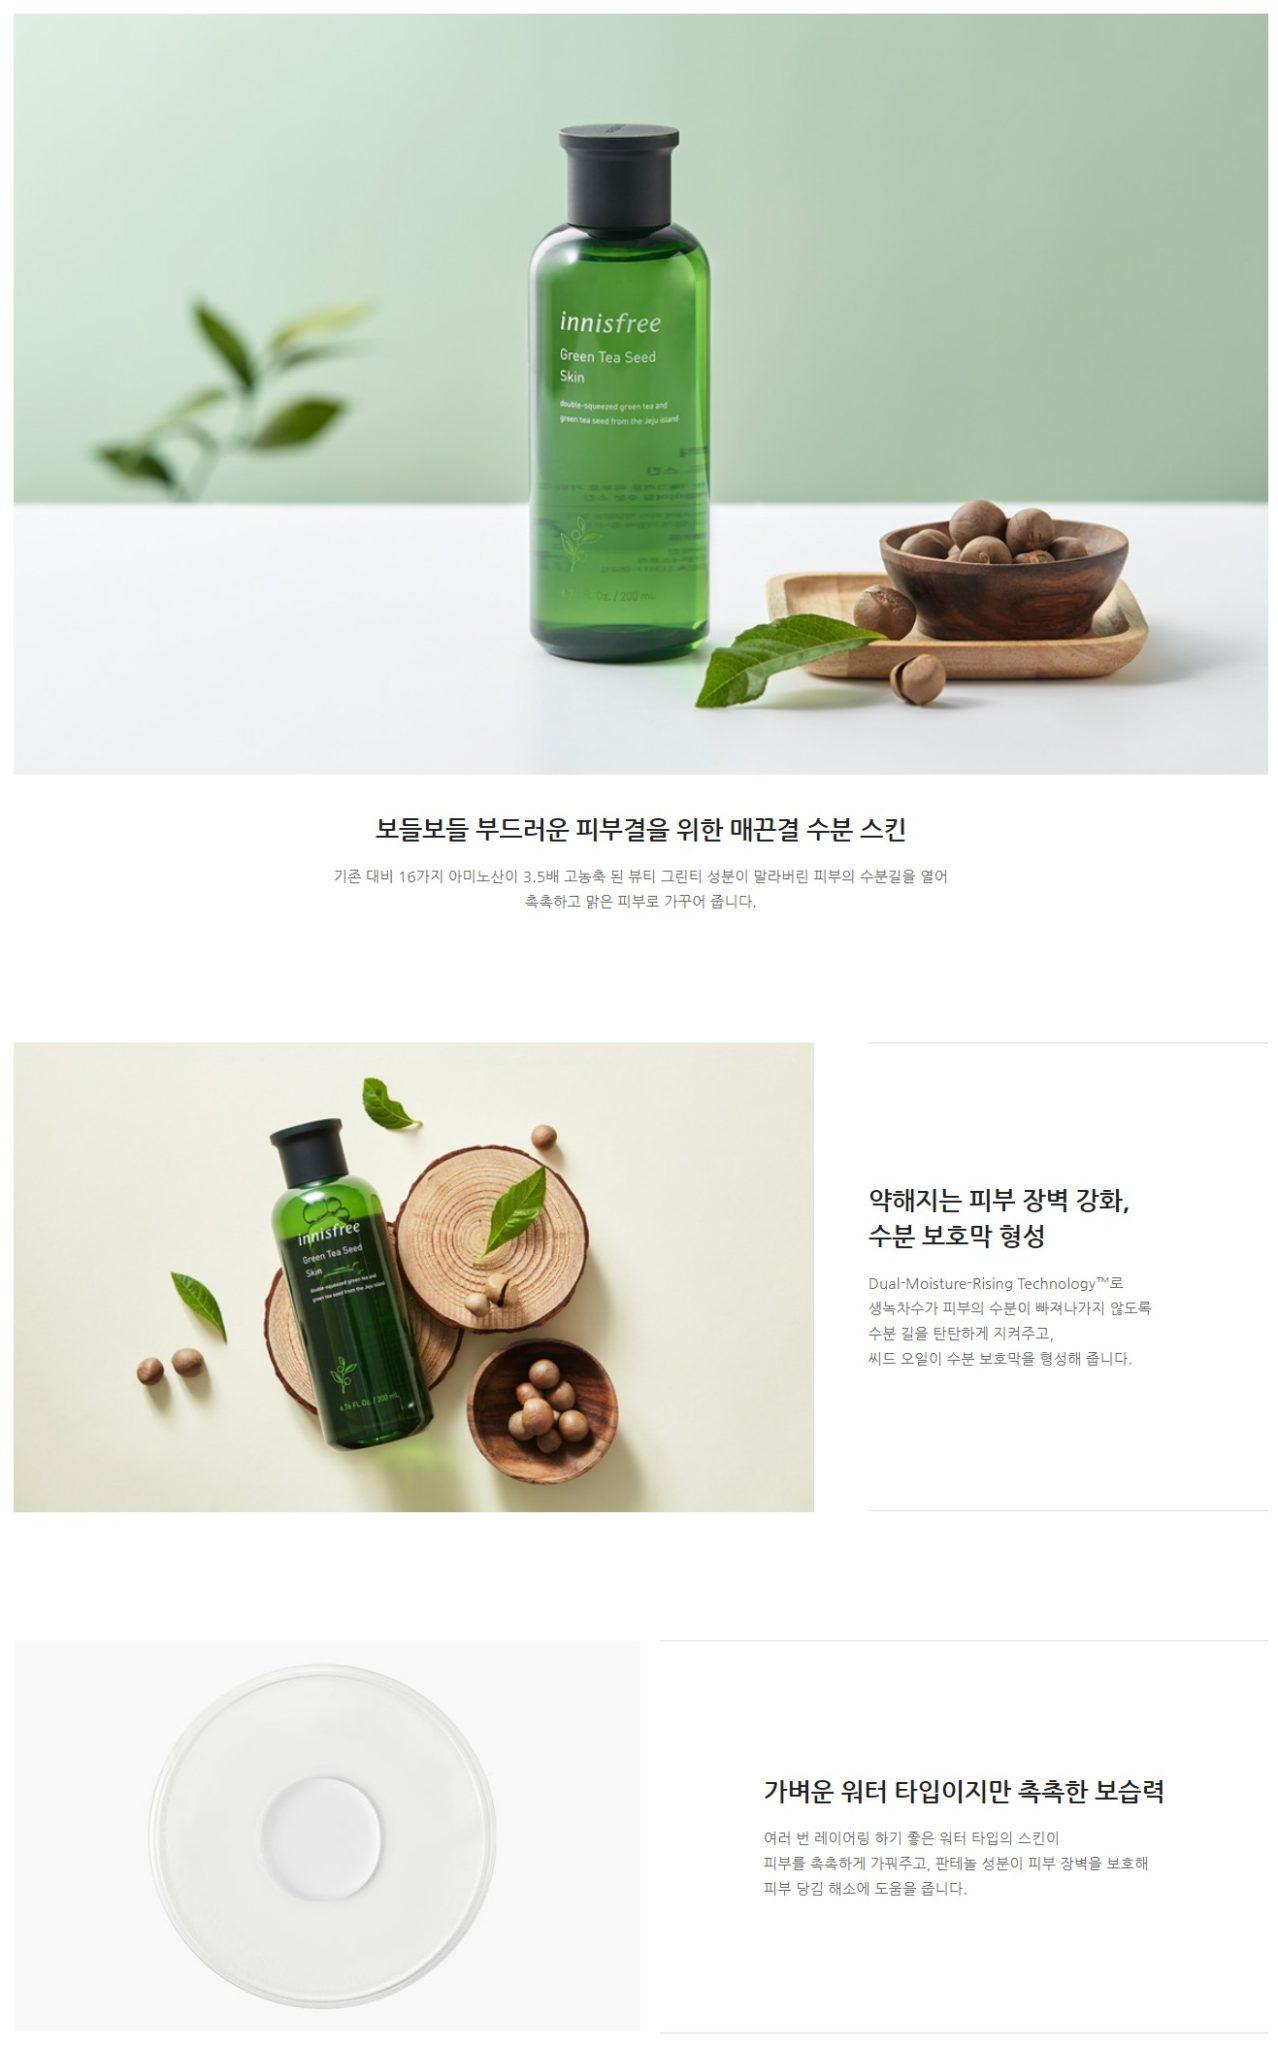 Innisfree Green Tea Seed Skin (6.76oz / 200ml)